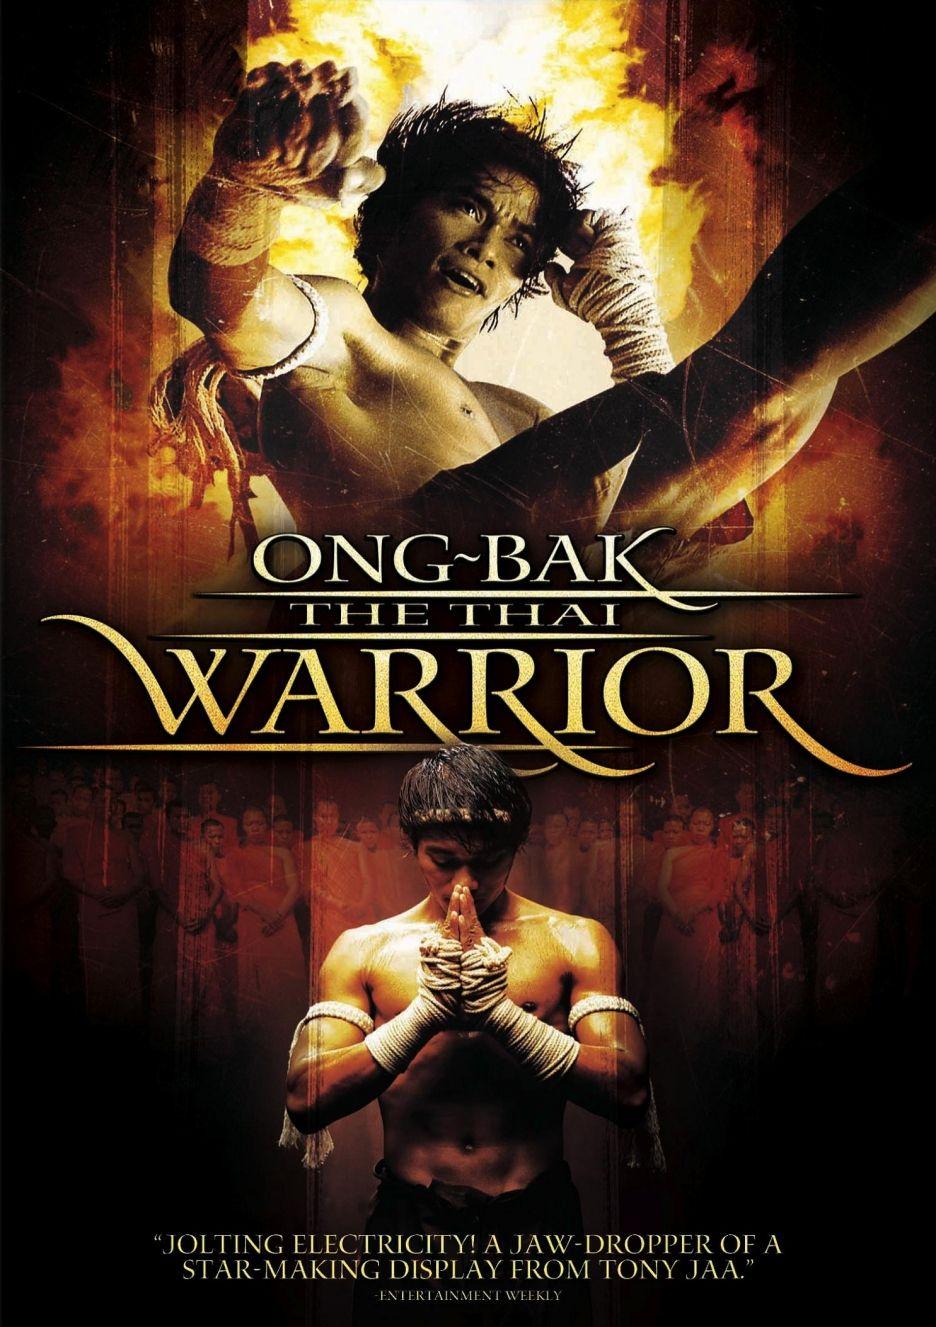 ong bak 2003 full movie in hindi